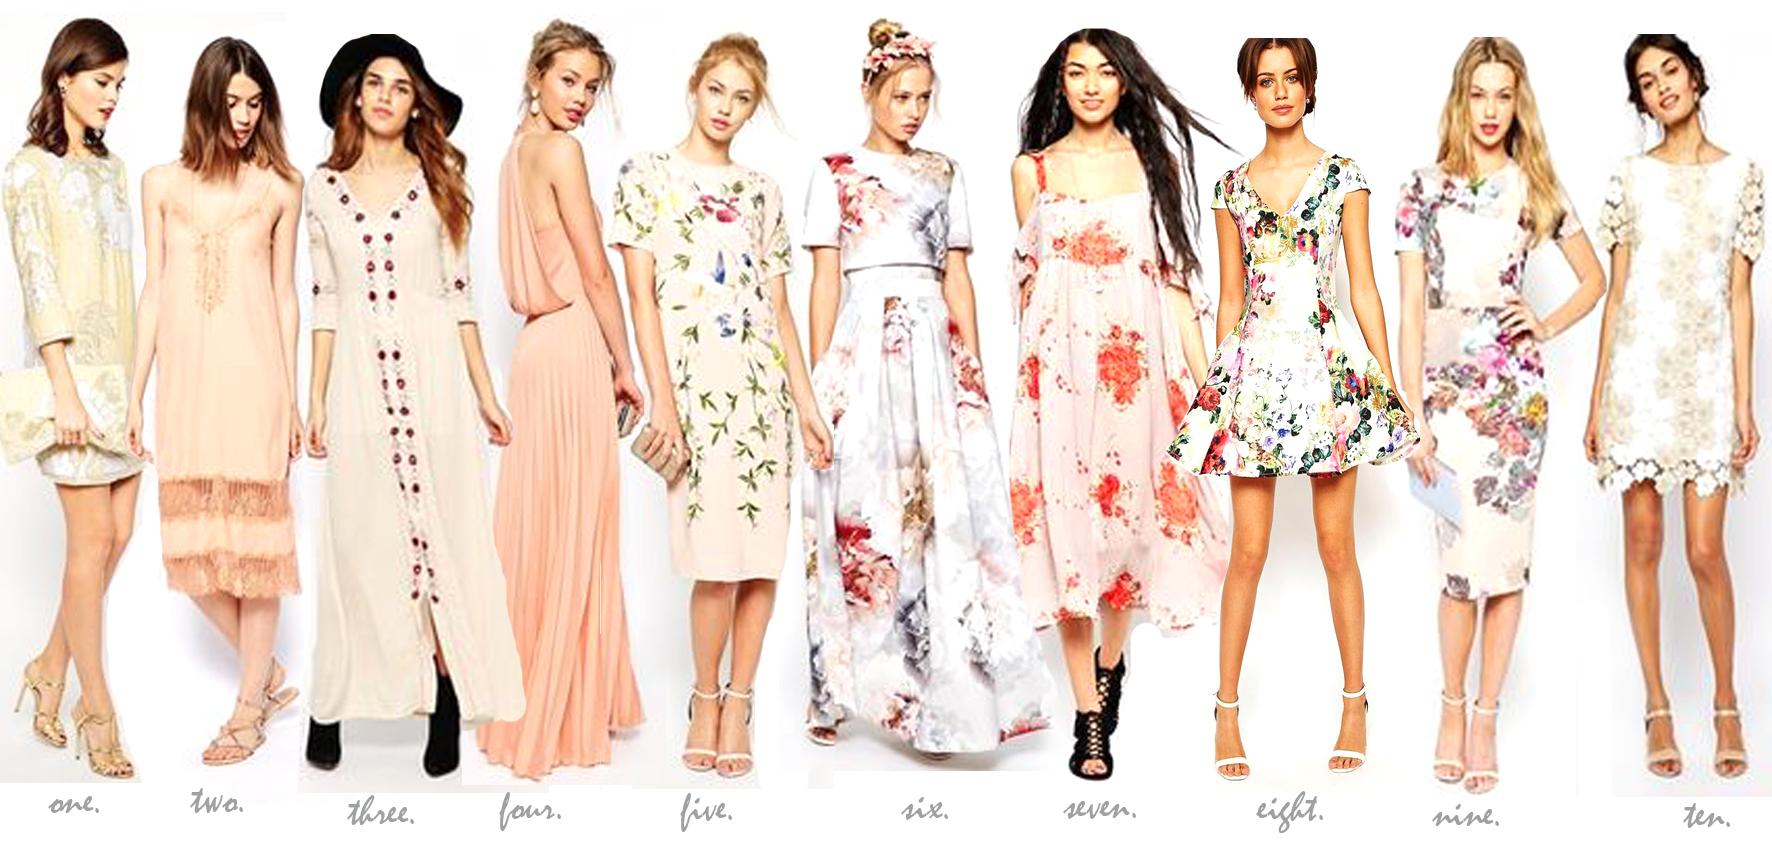 10 most wanted asos wedding dress season x 2 10wanted wedding dress 1 ombrellifo Gallery